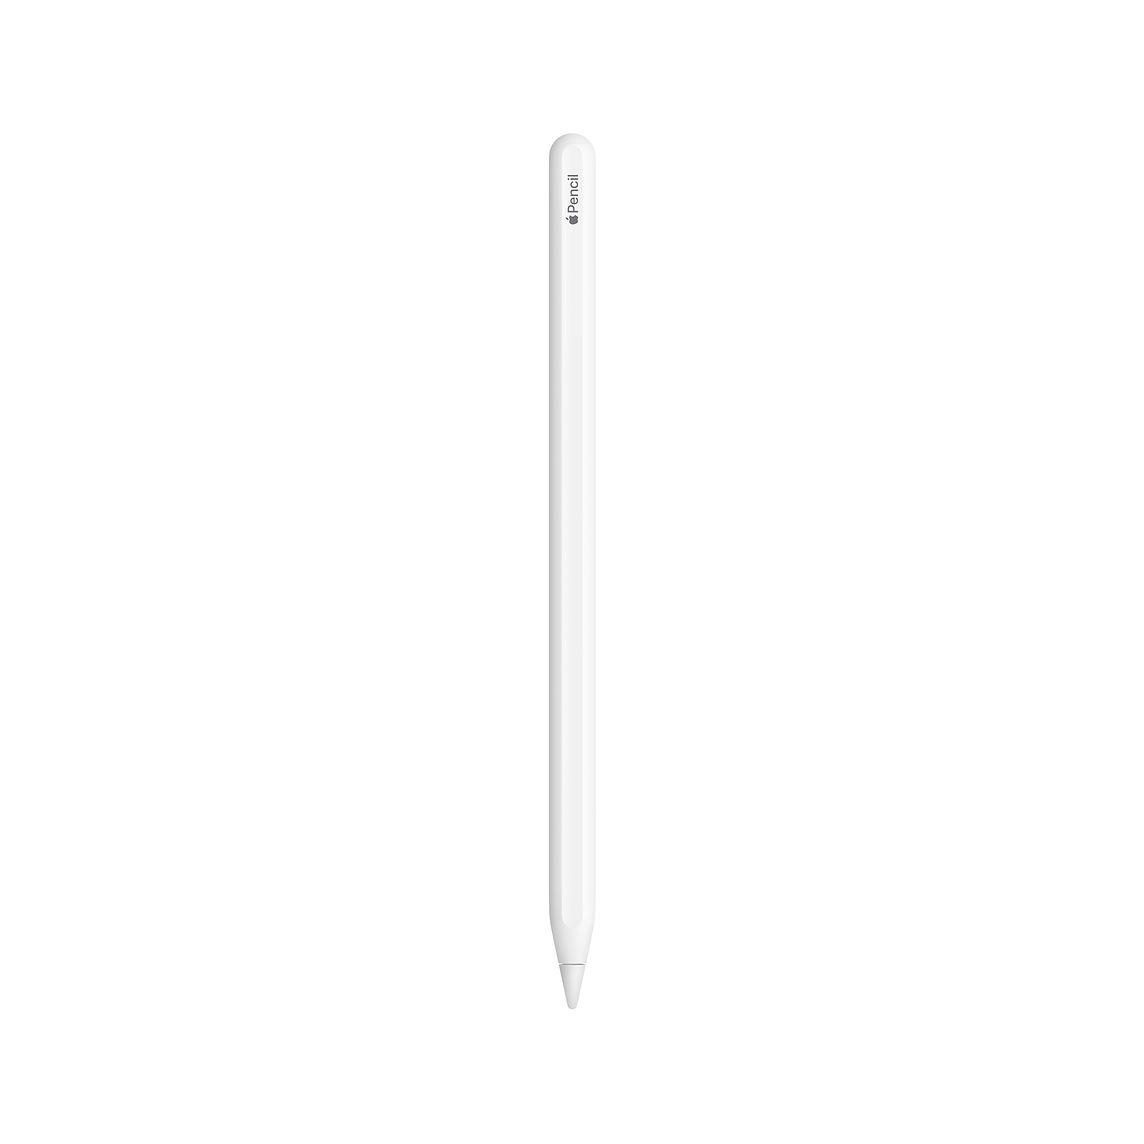 Bút cảm ứng Apple Pencil 2 MU8F2 MỚI (Fullbox)